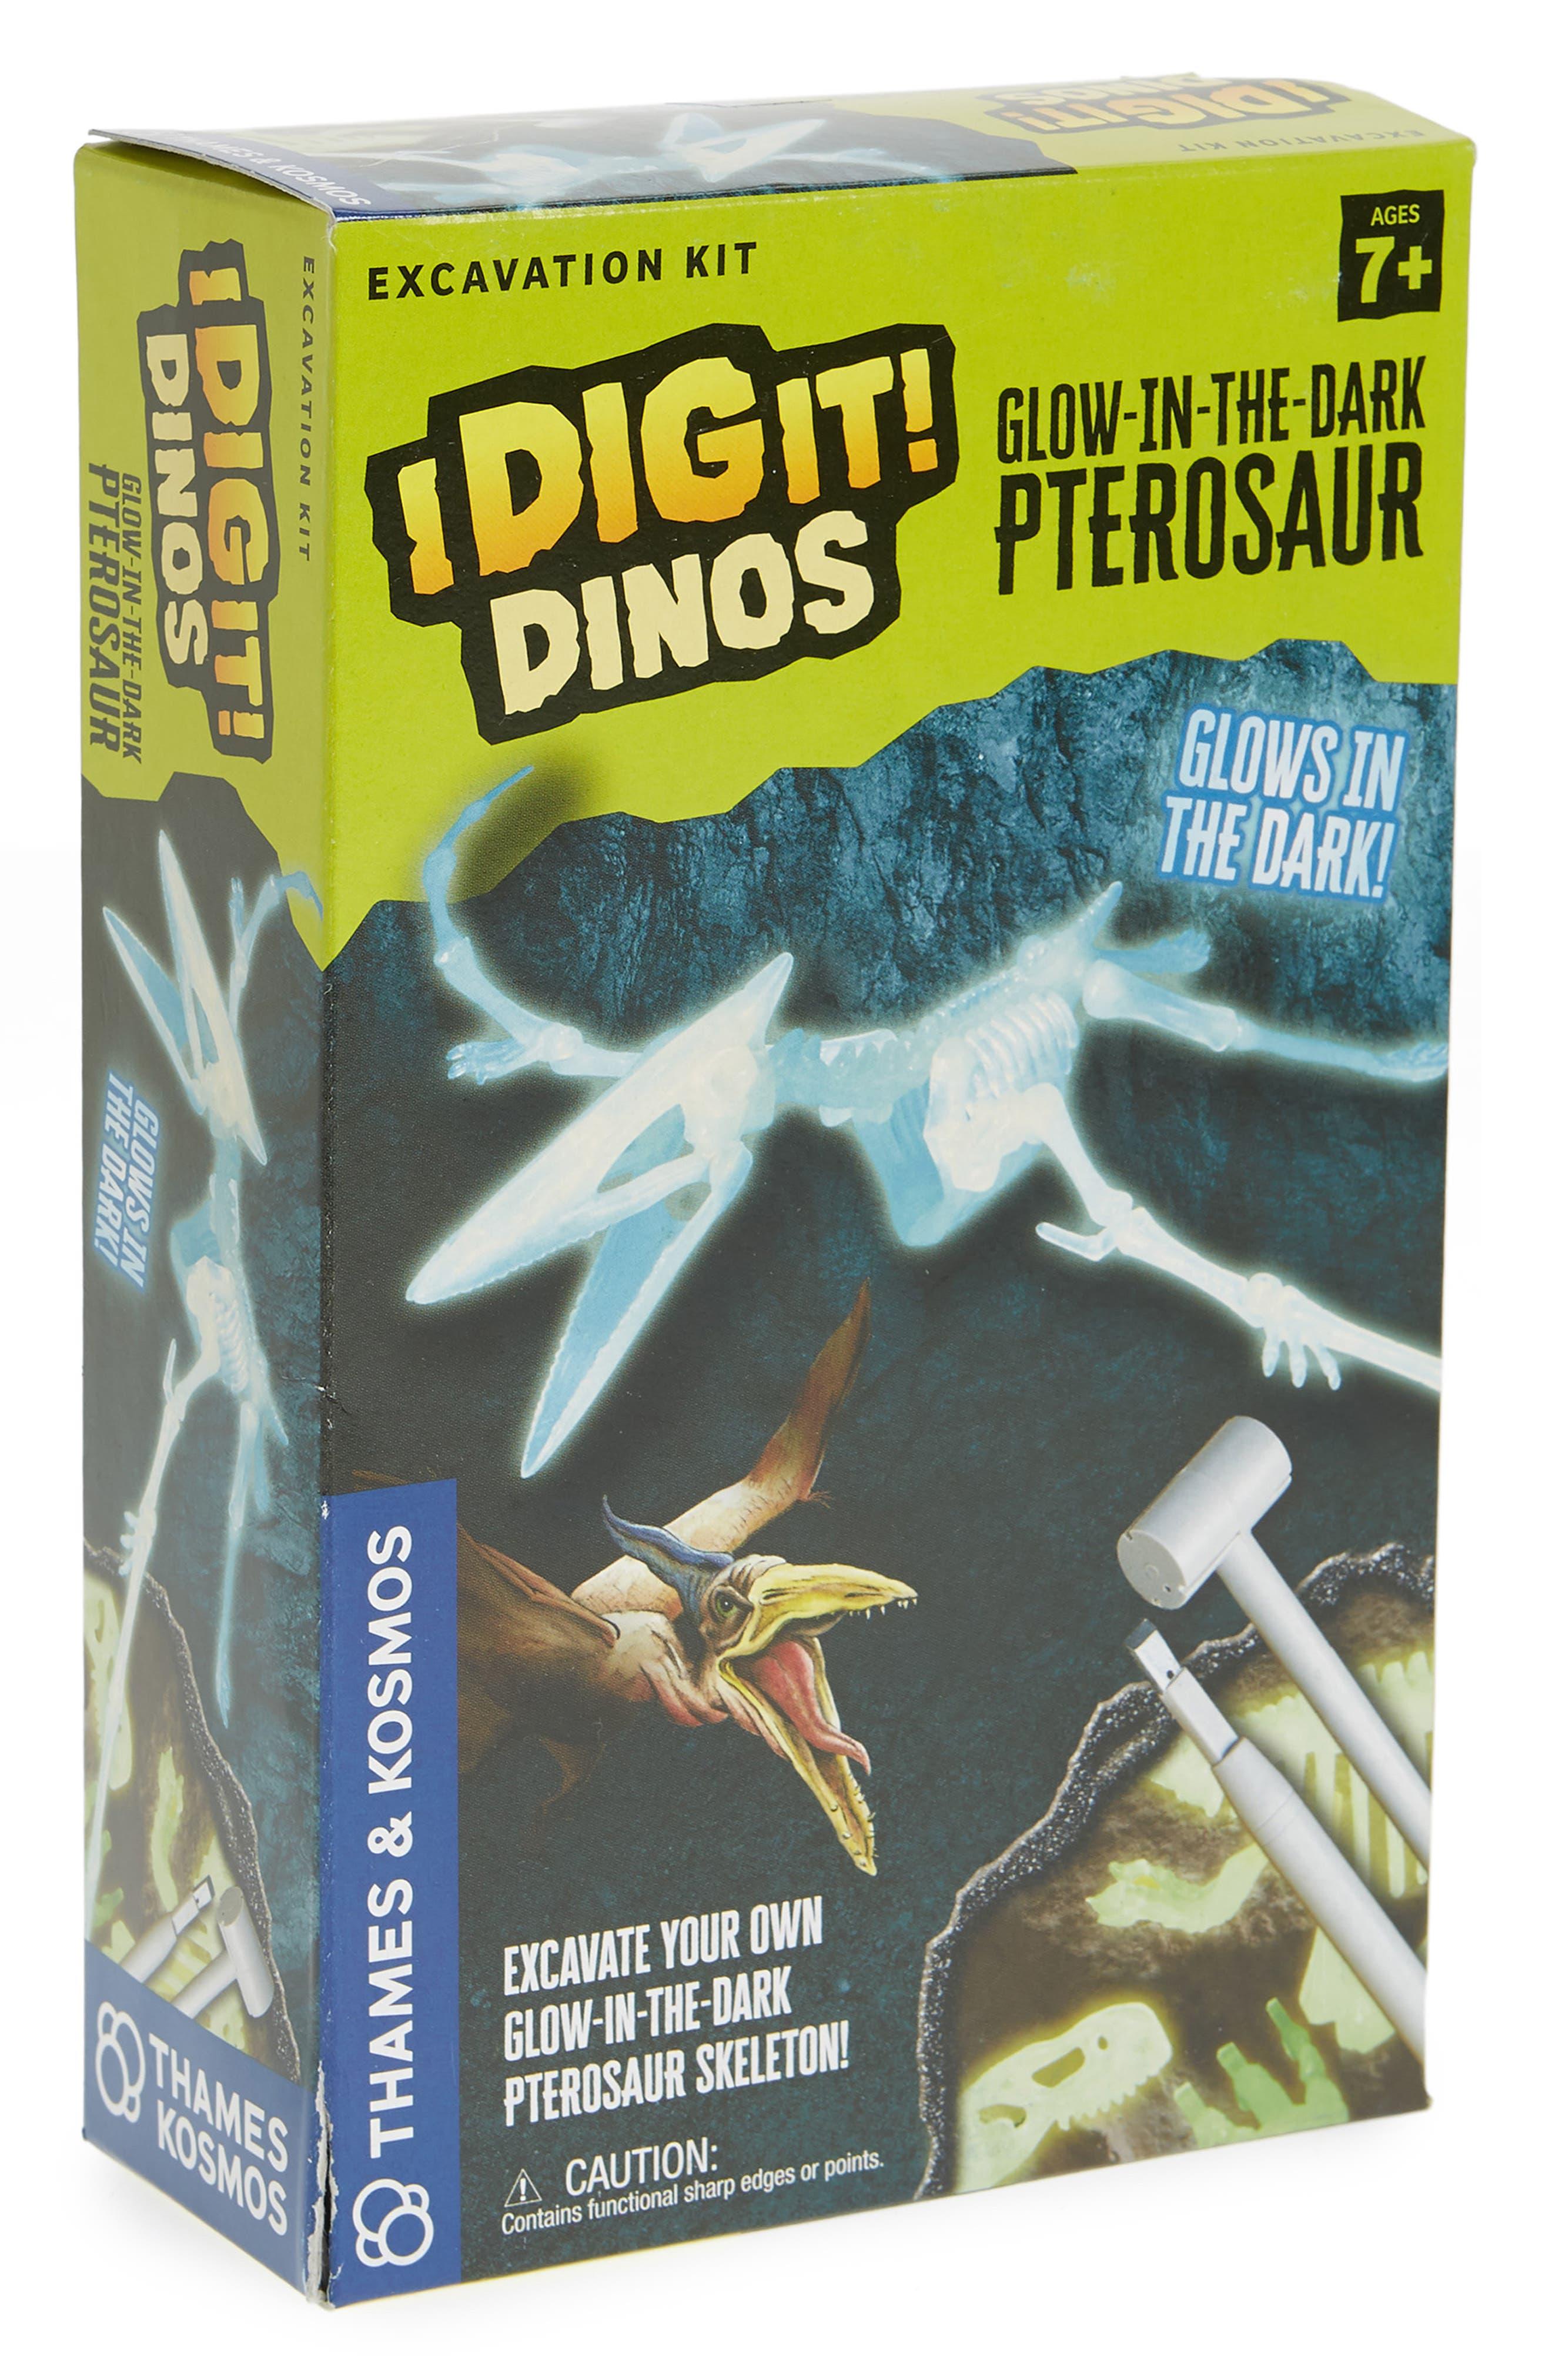 Thames & Kosmos I Dig It! 16-Piece Glow in the Dark Pterosaur Excavation Kit